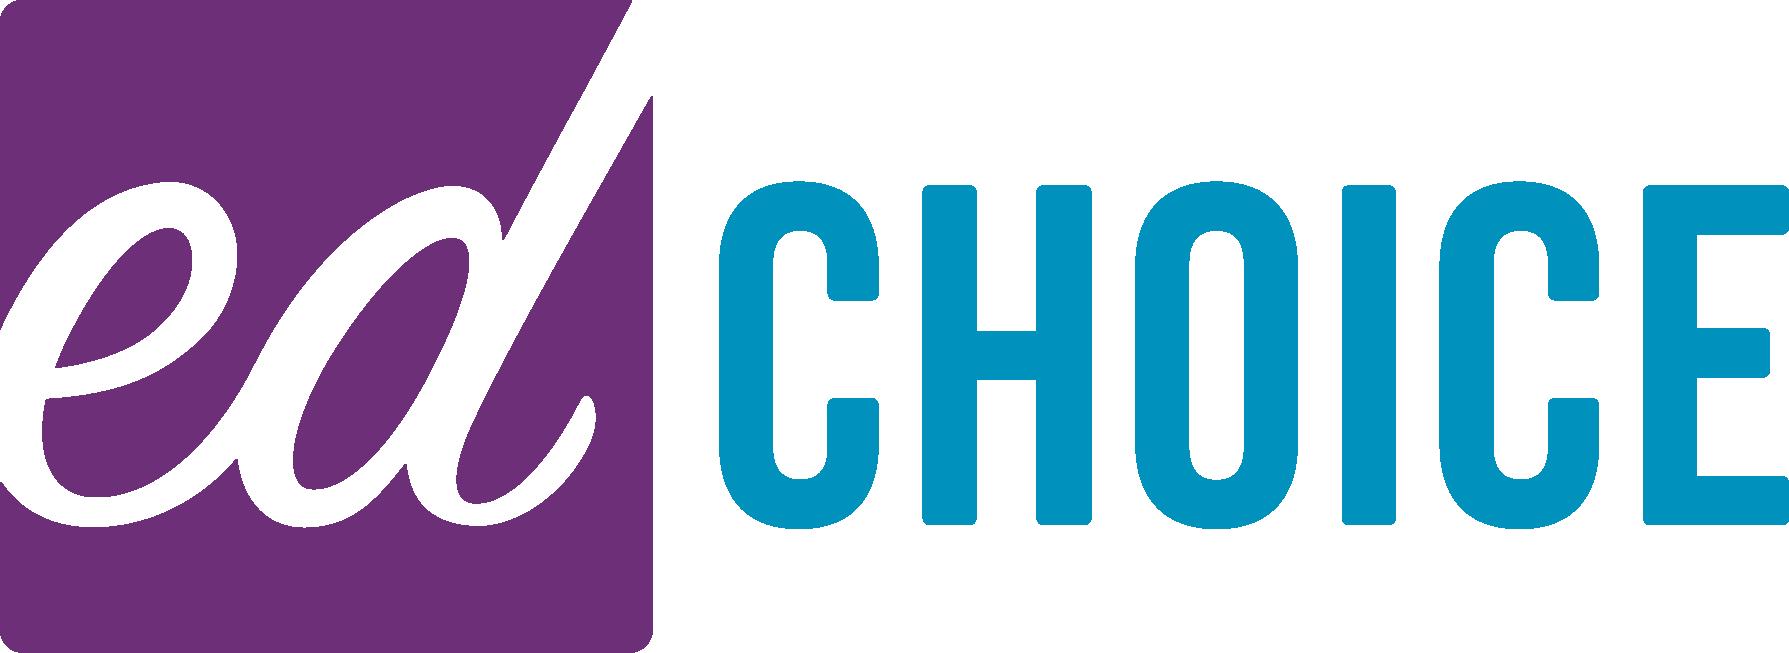 EdChoice logo.png